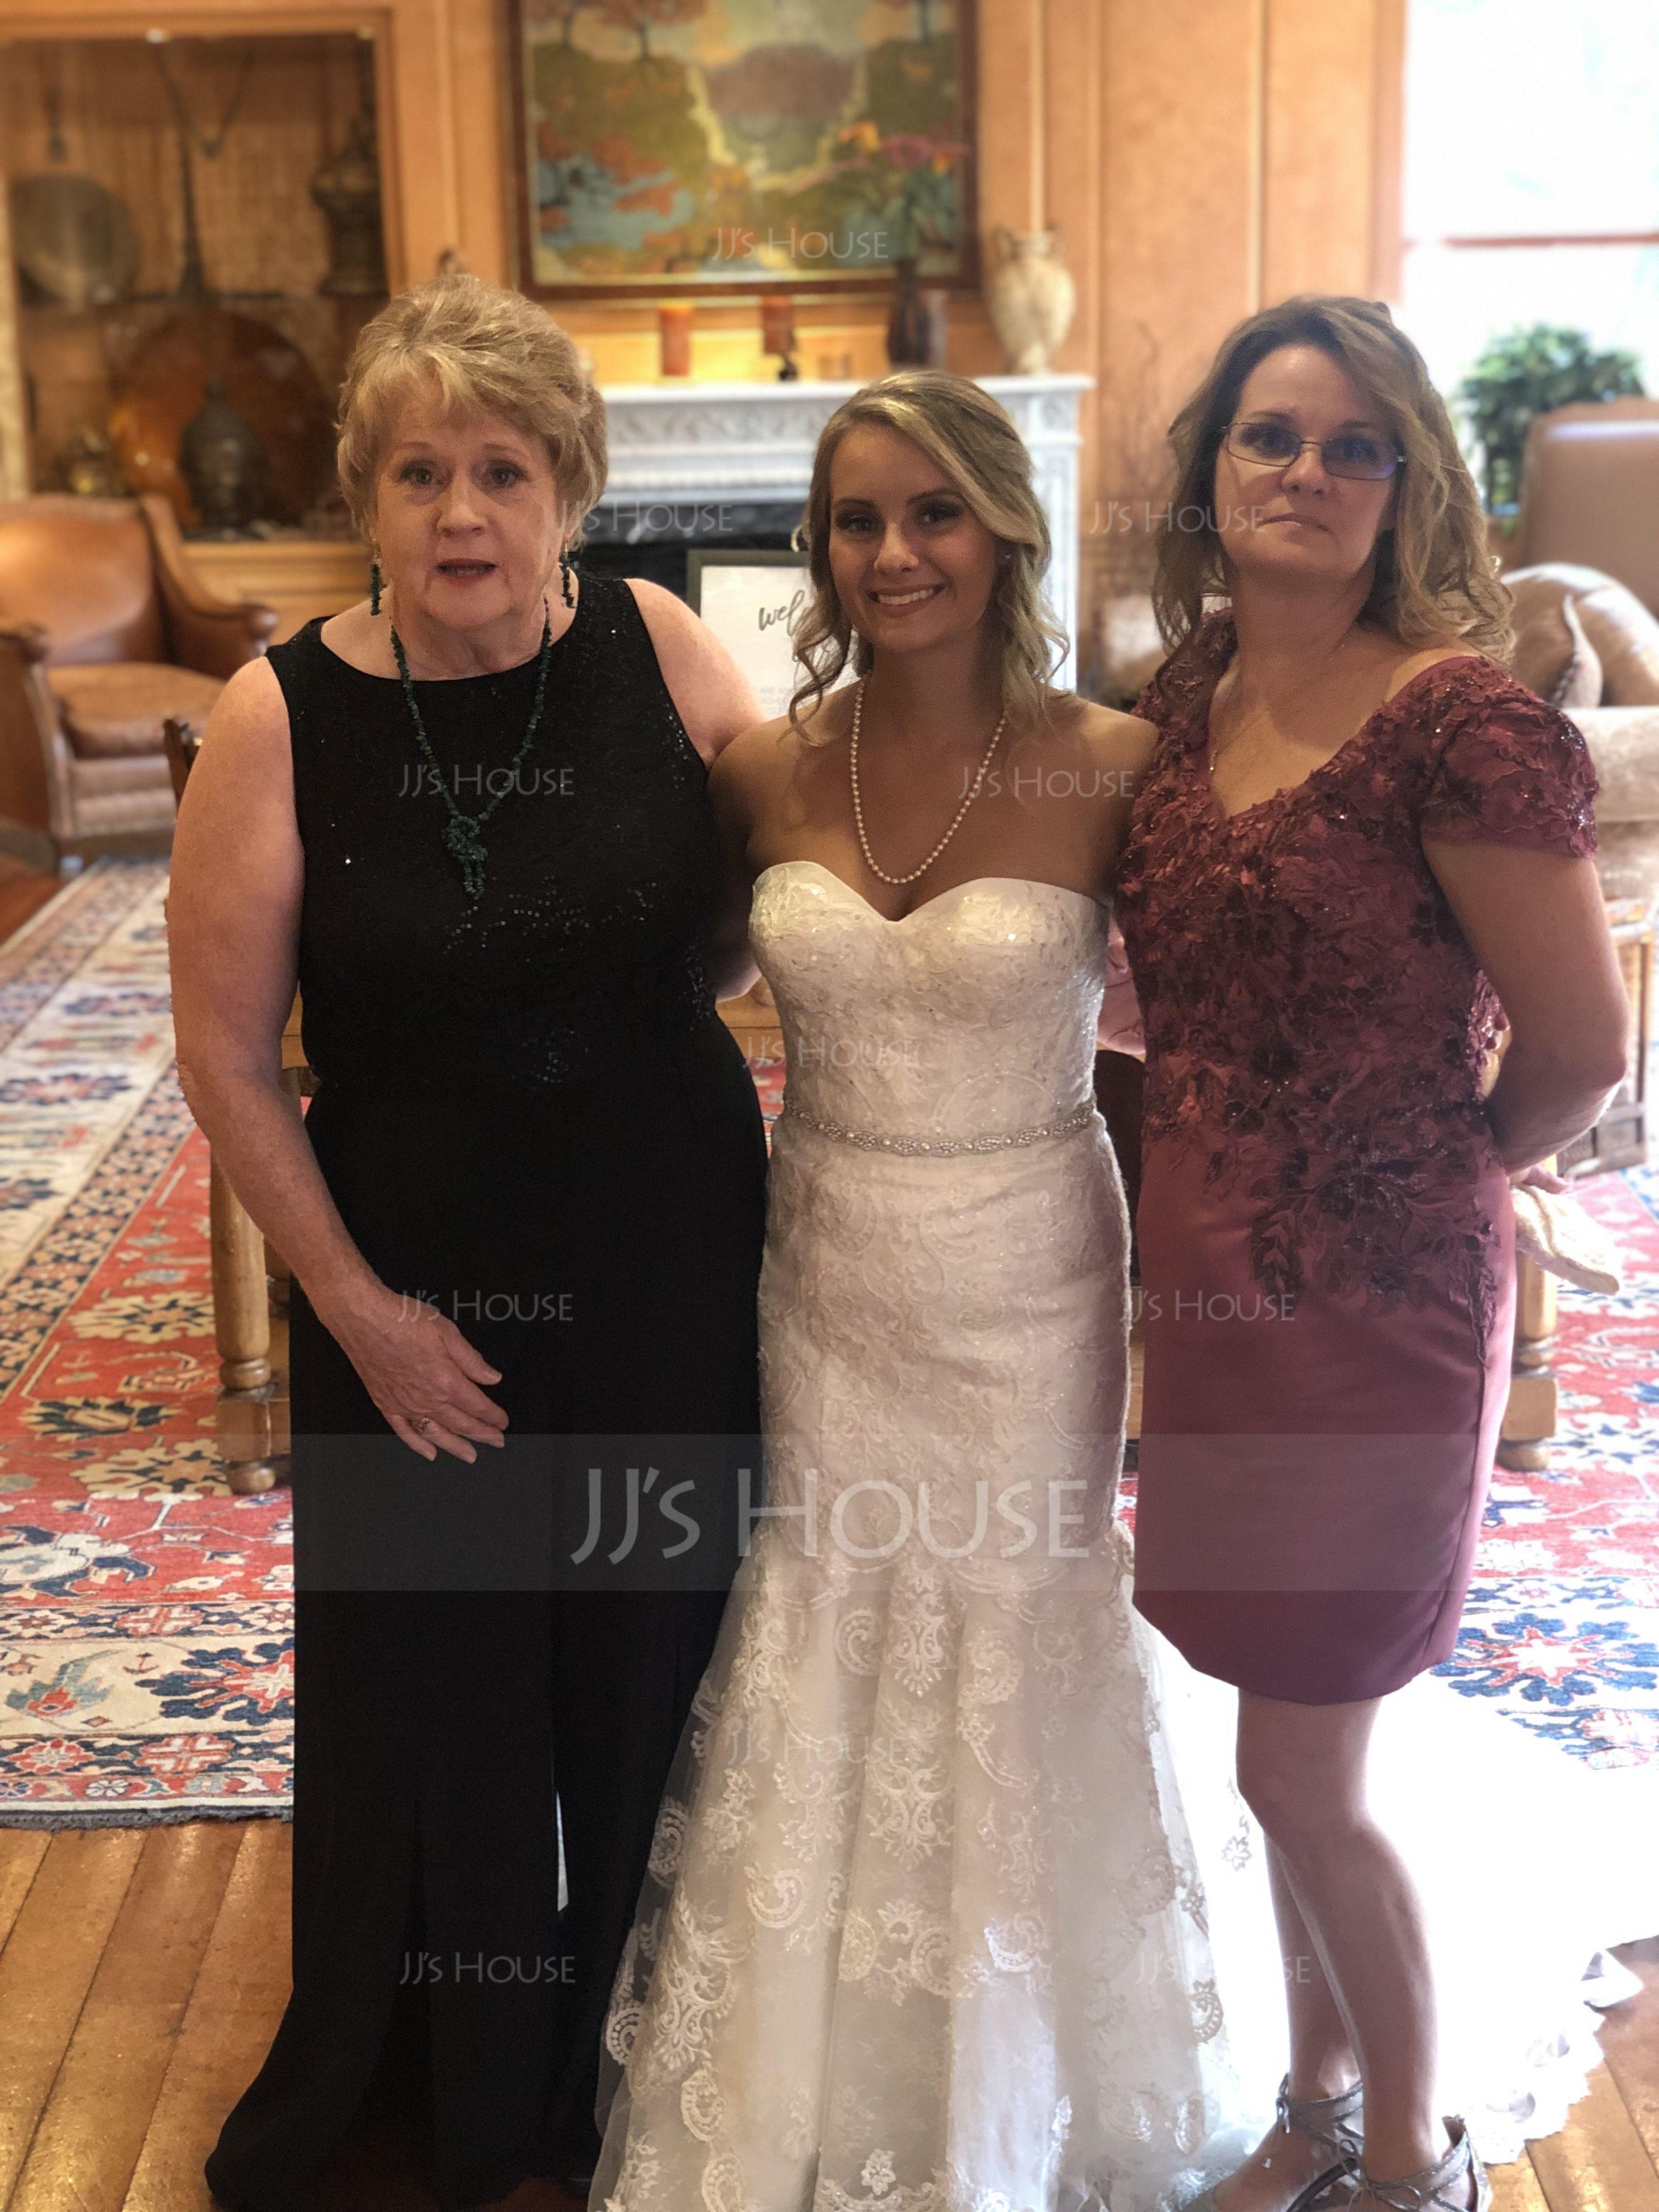 Sheath/Column V-neck Knee-Length Satin Lace Mother of the Bride Dress (008179202)